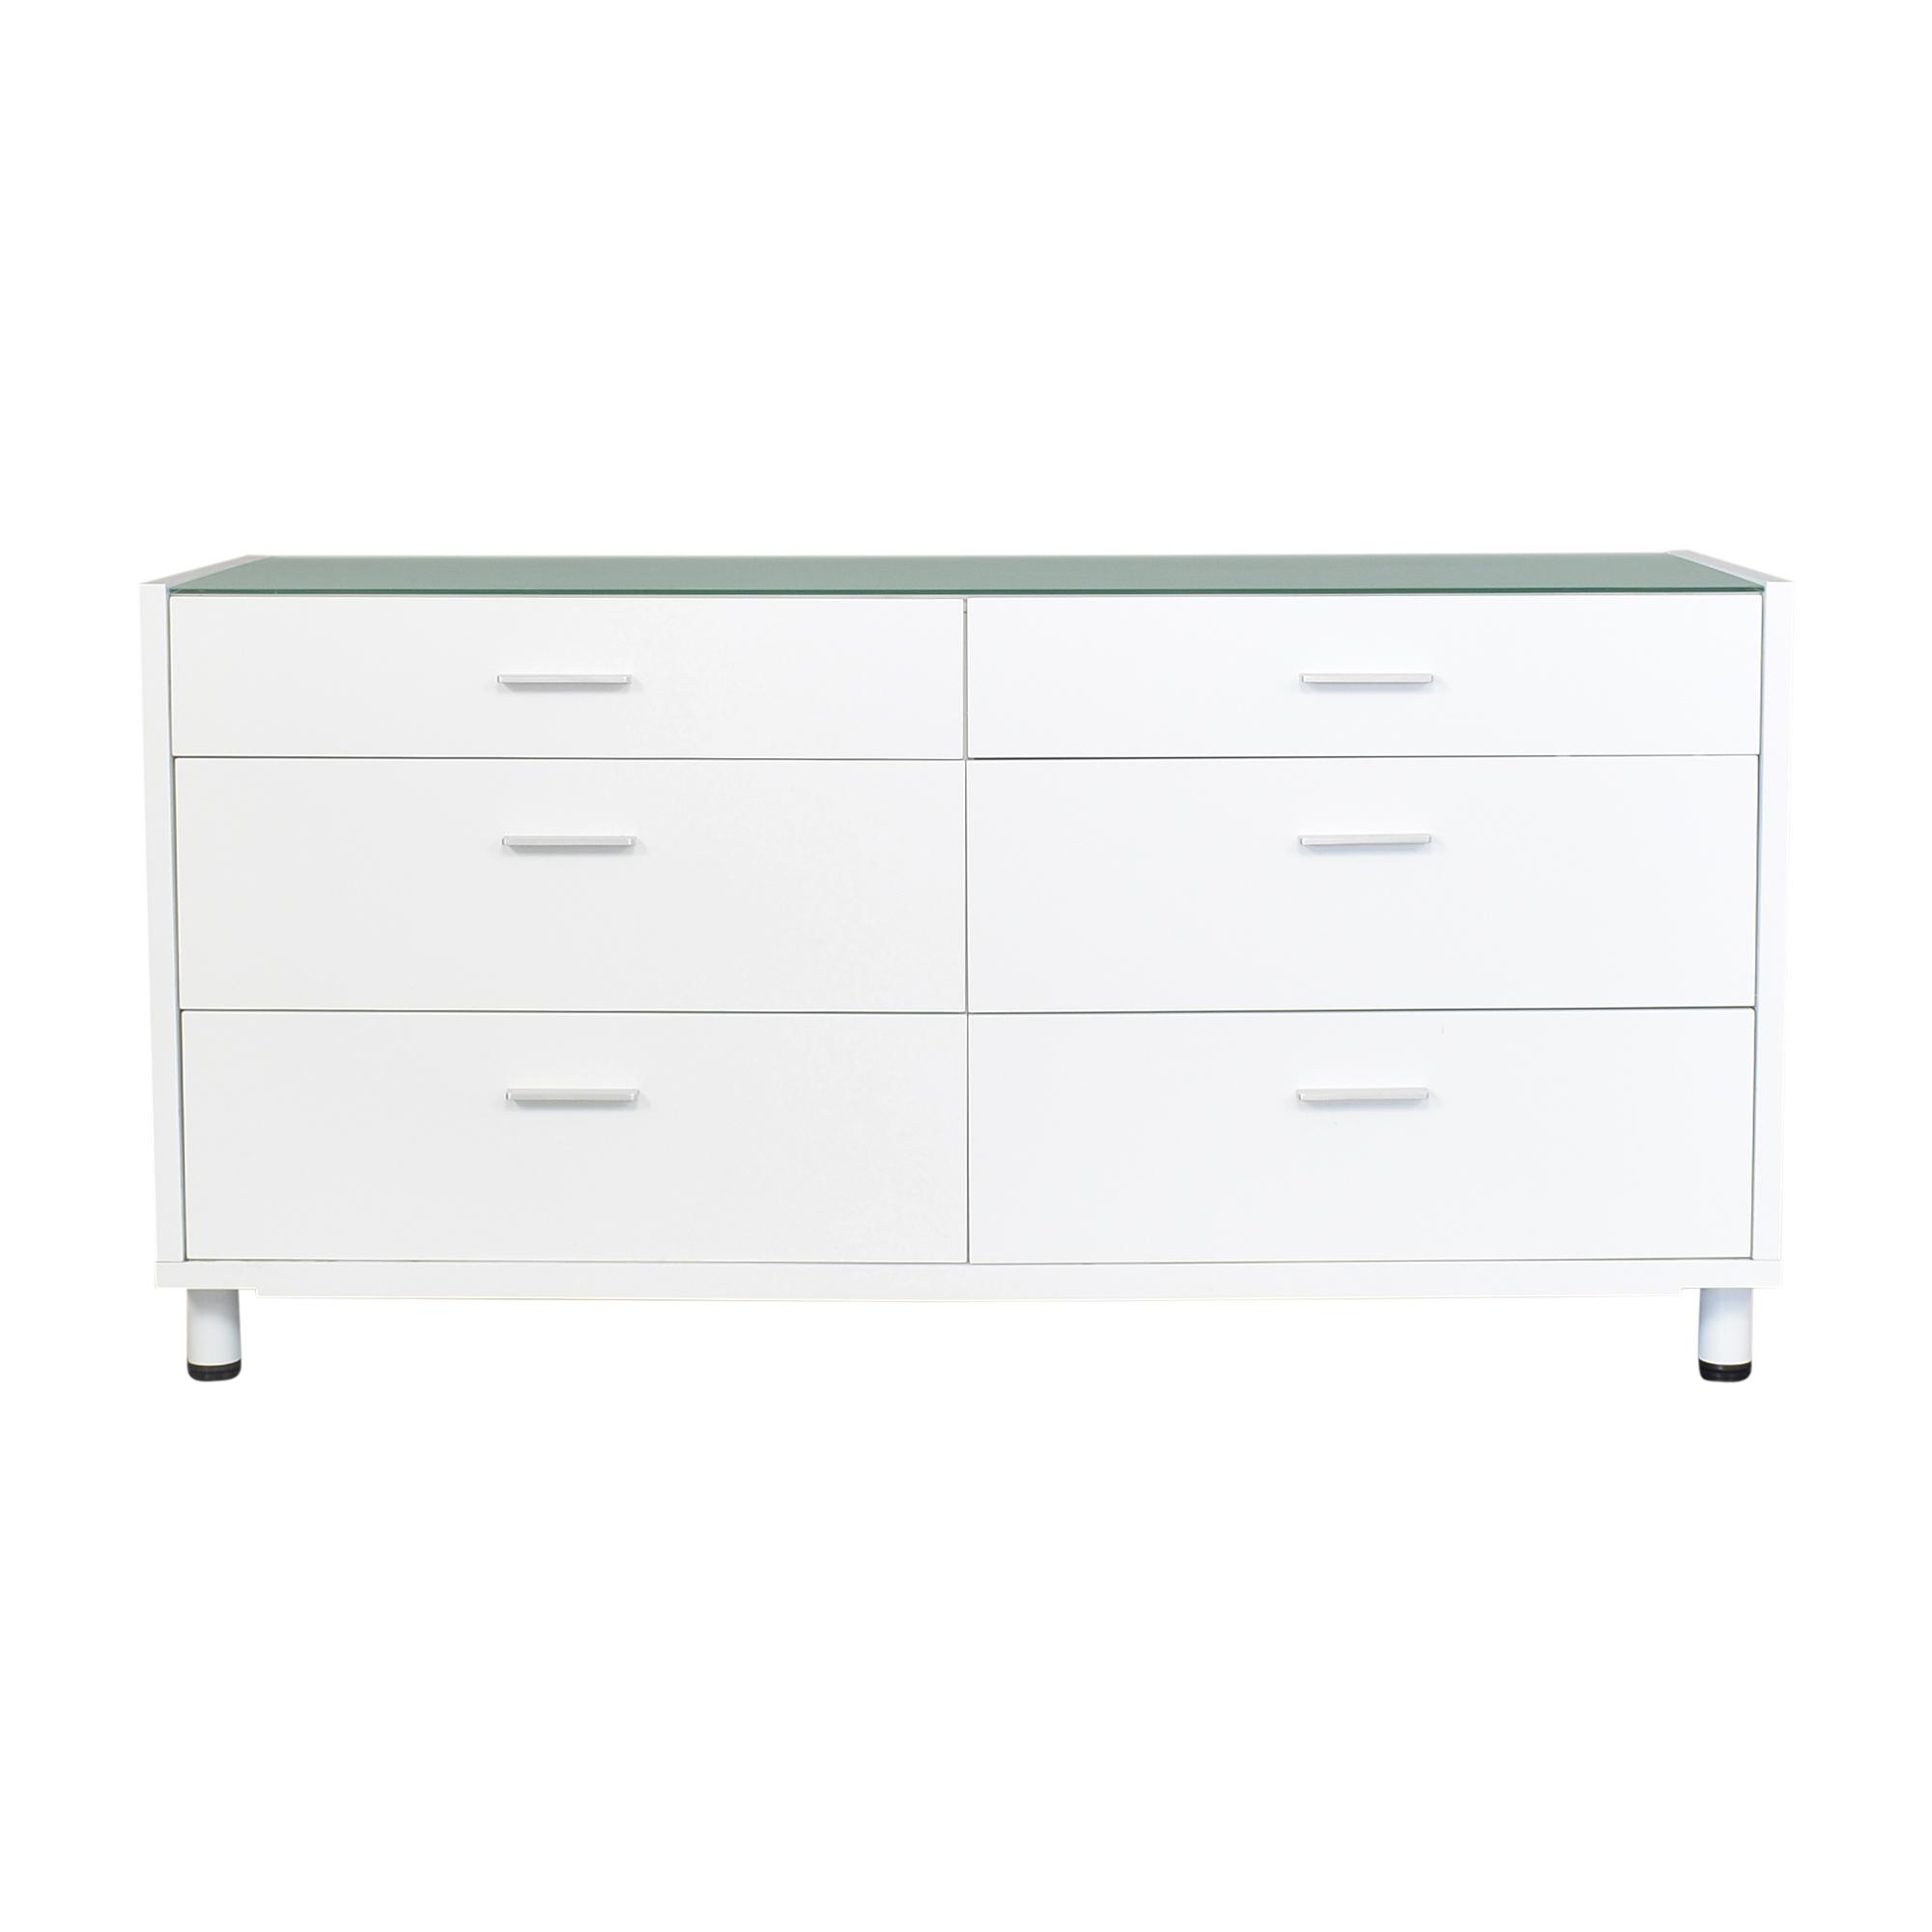 Ana Furniture Ana Furniture Double Dresser nyc